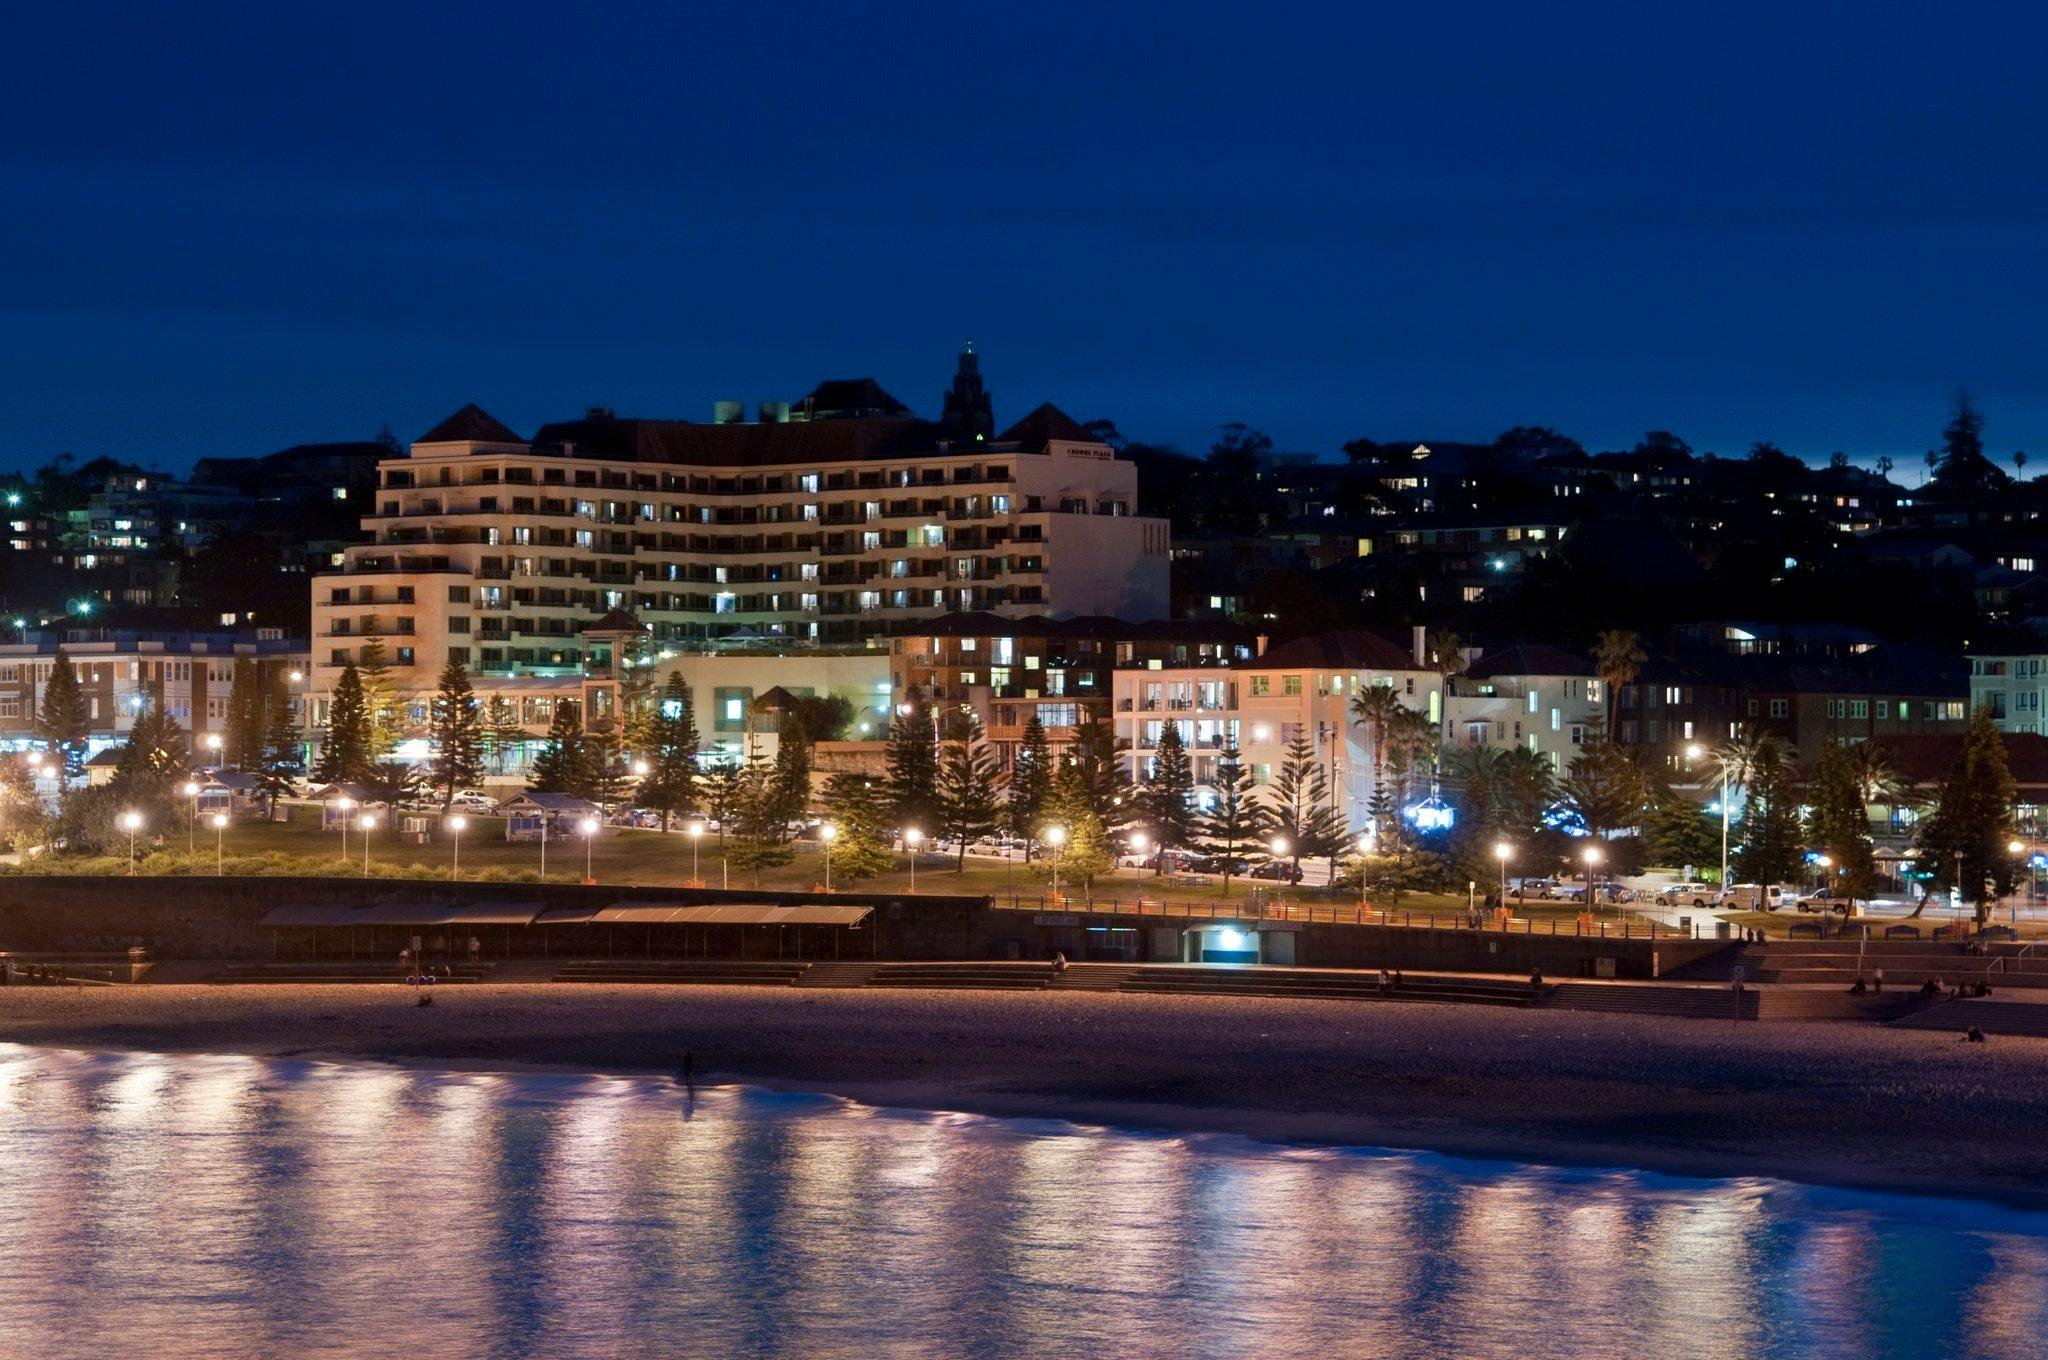 Crowne Plaza Hotel Coogee Beach - Sydney